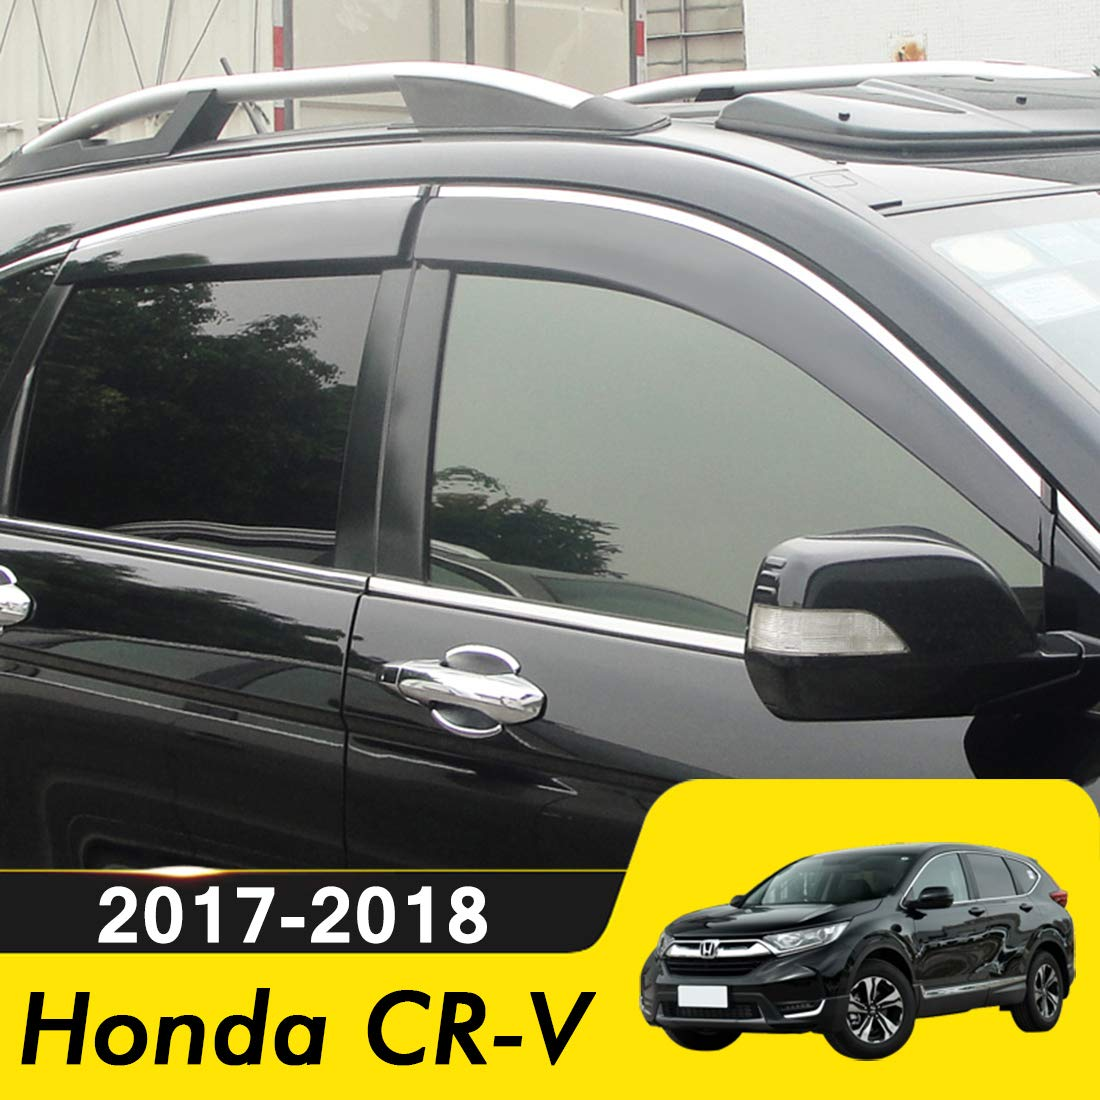 biosp Compatible for 2017 Honda CR-V Visor Rain Sun Deflectors Car CRV Window Ventvisor Shade Wind Deflector